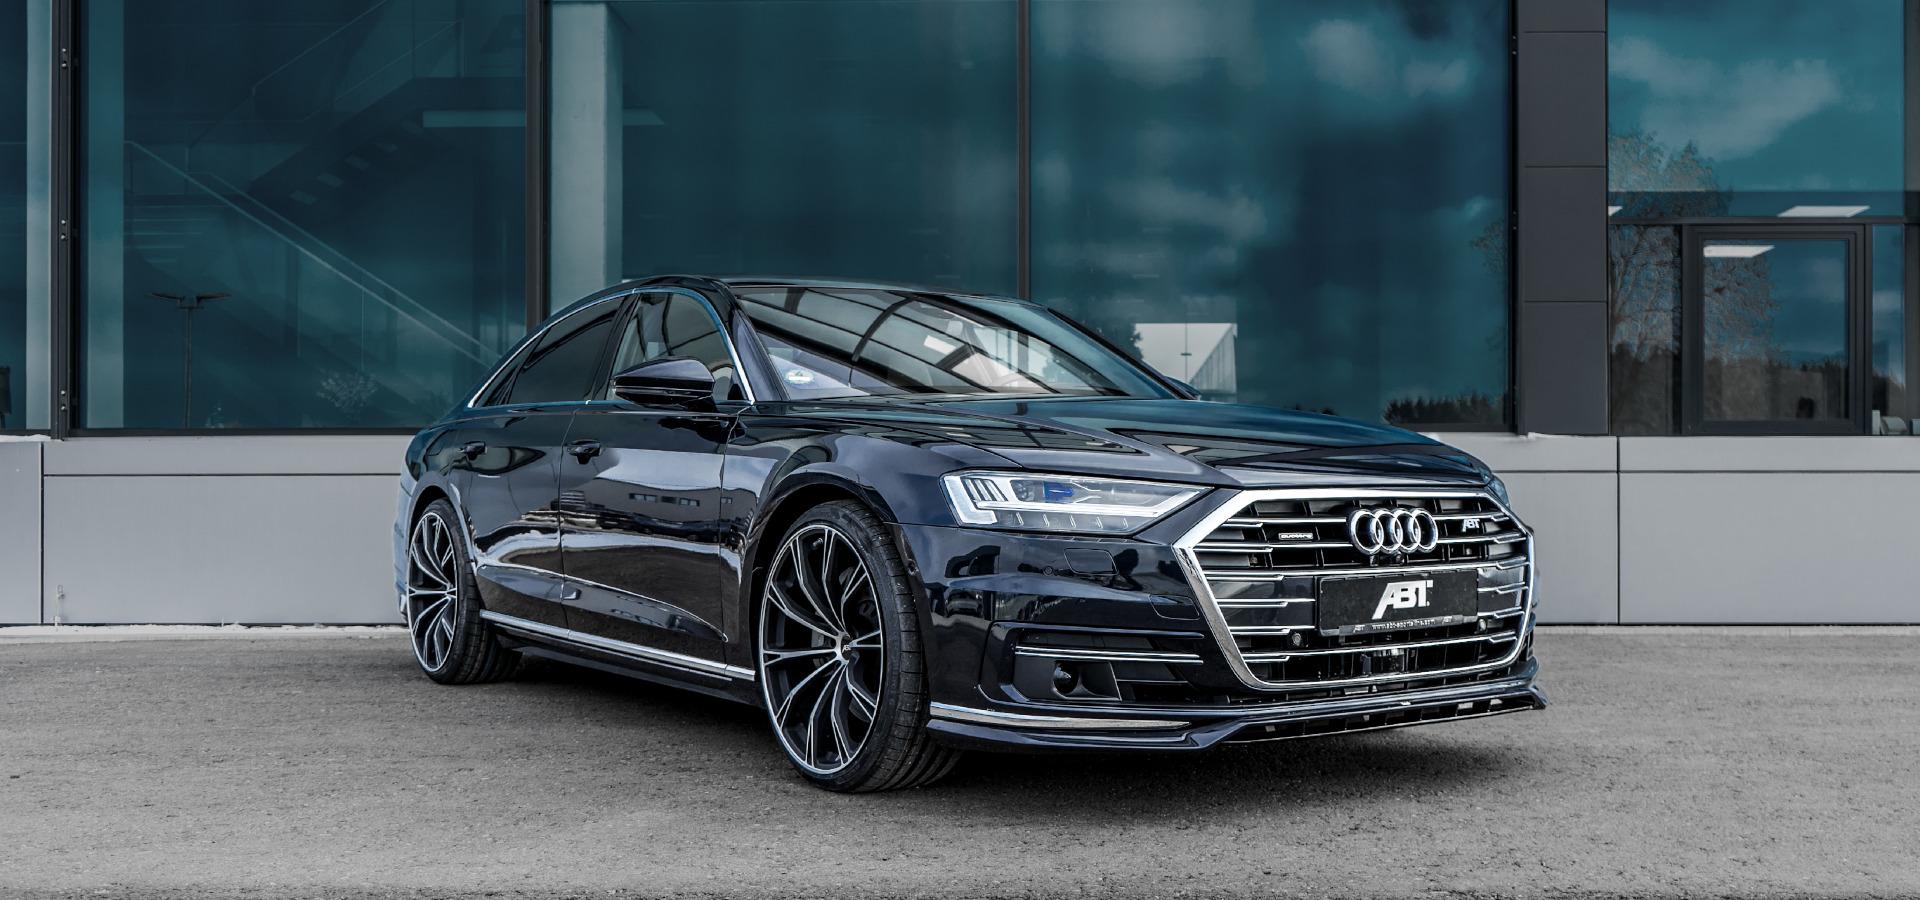 Kekurangan A8 Audi 2019 Top Model Tahun Ini